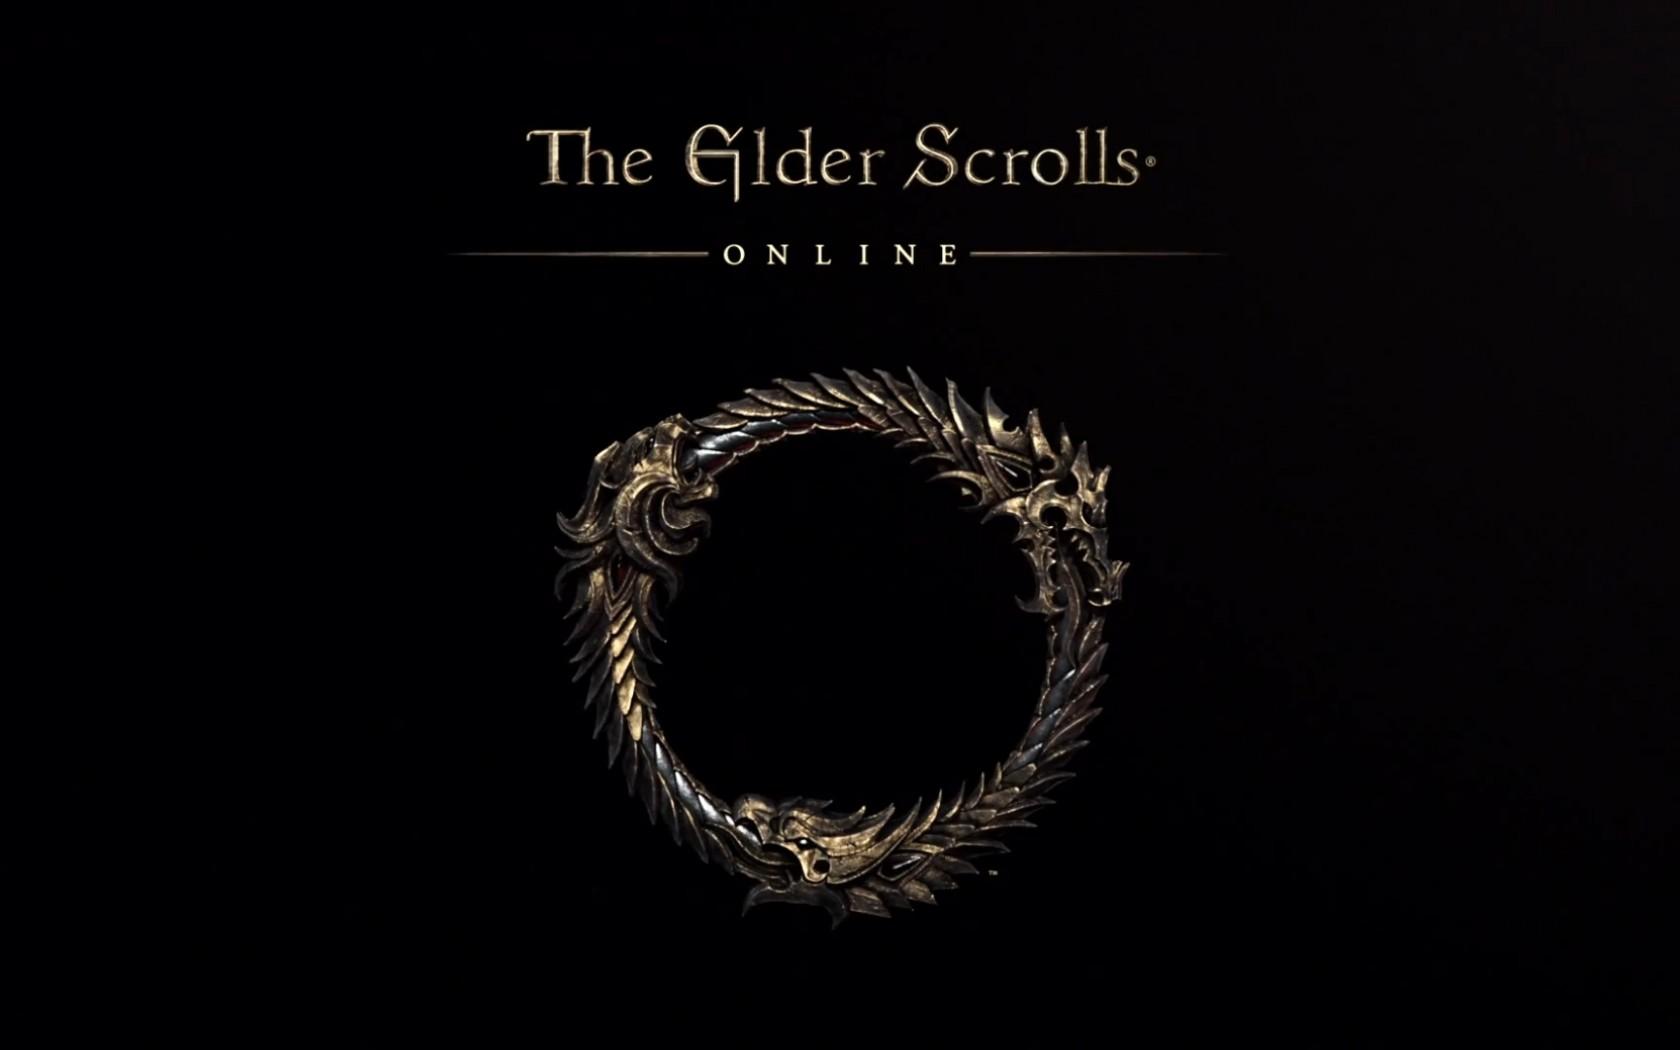 Wallpaper The Elder Scrolls Online: Logo